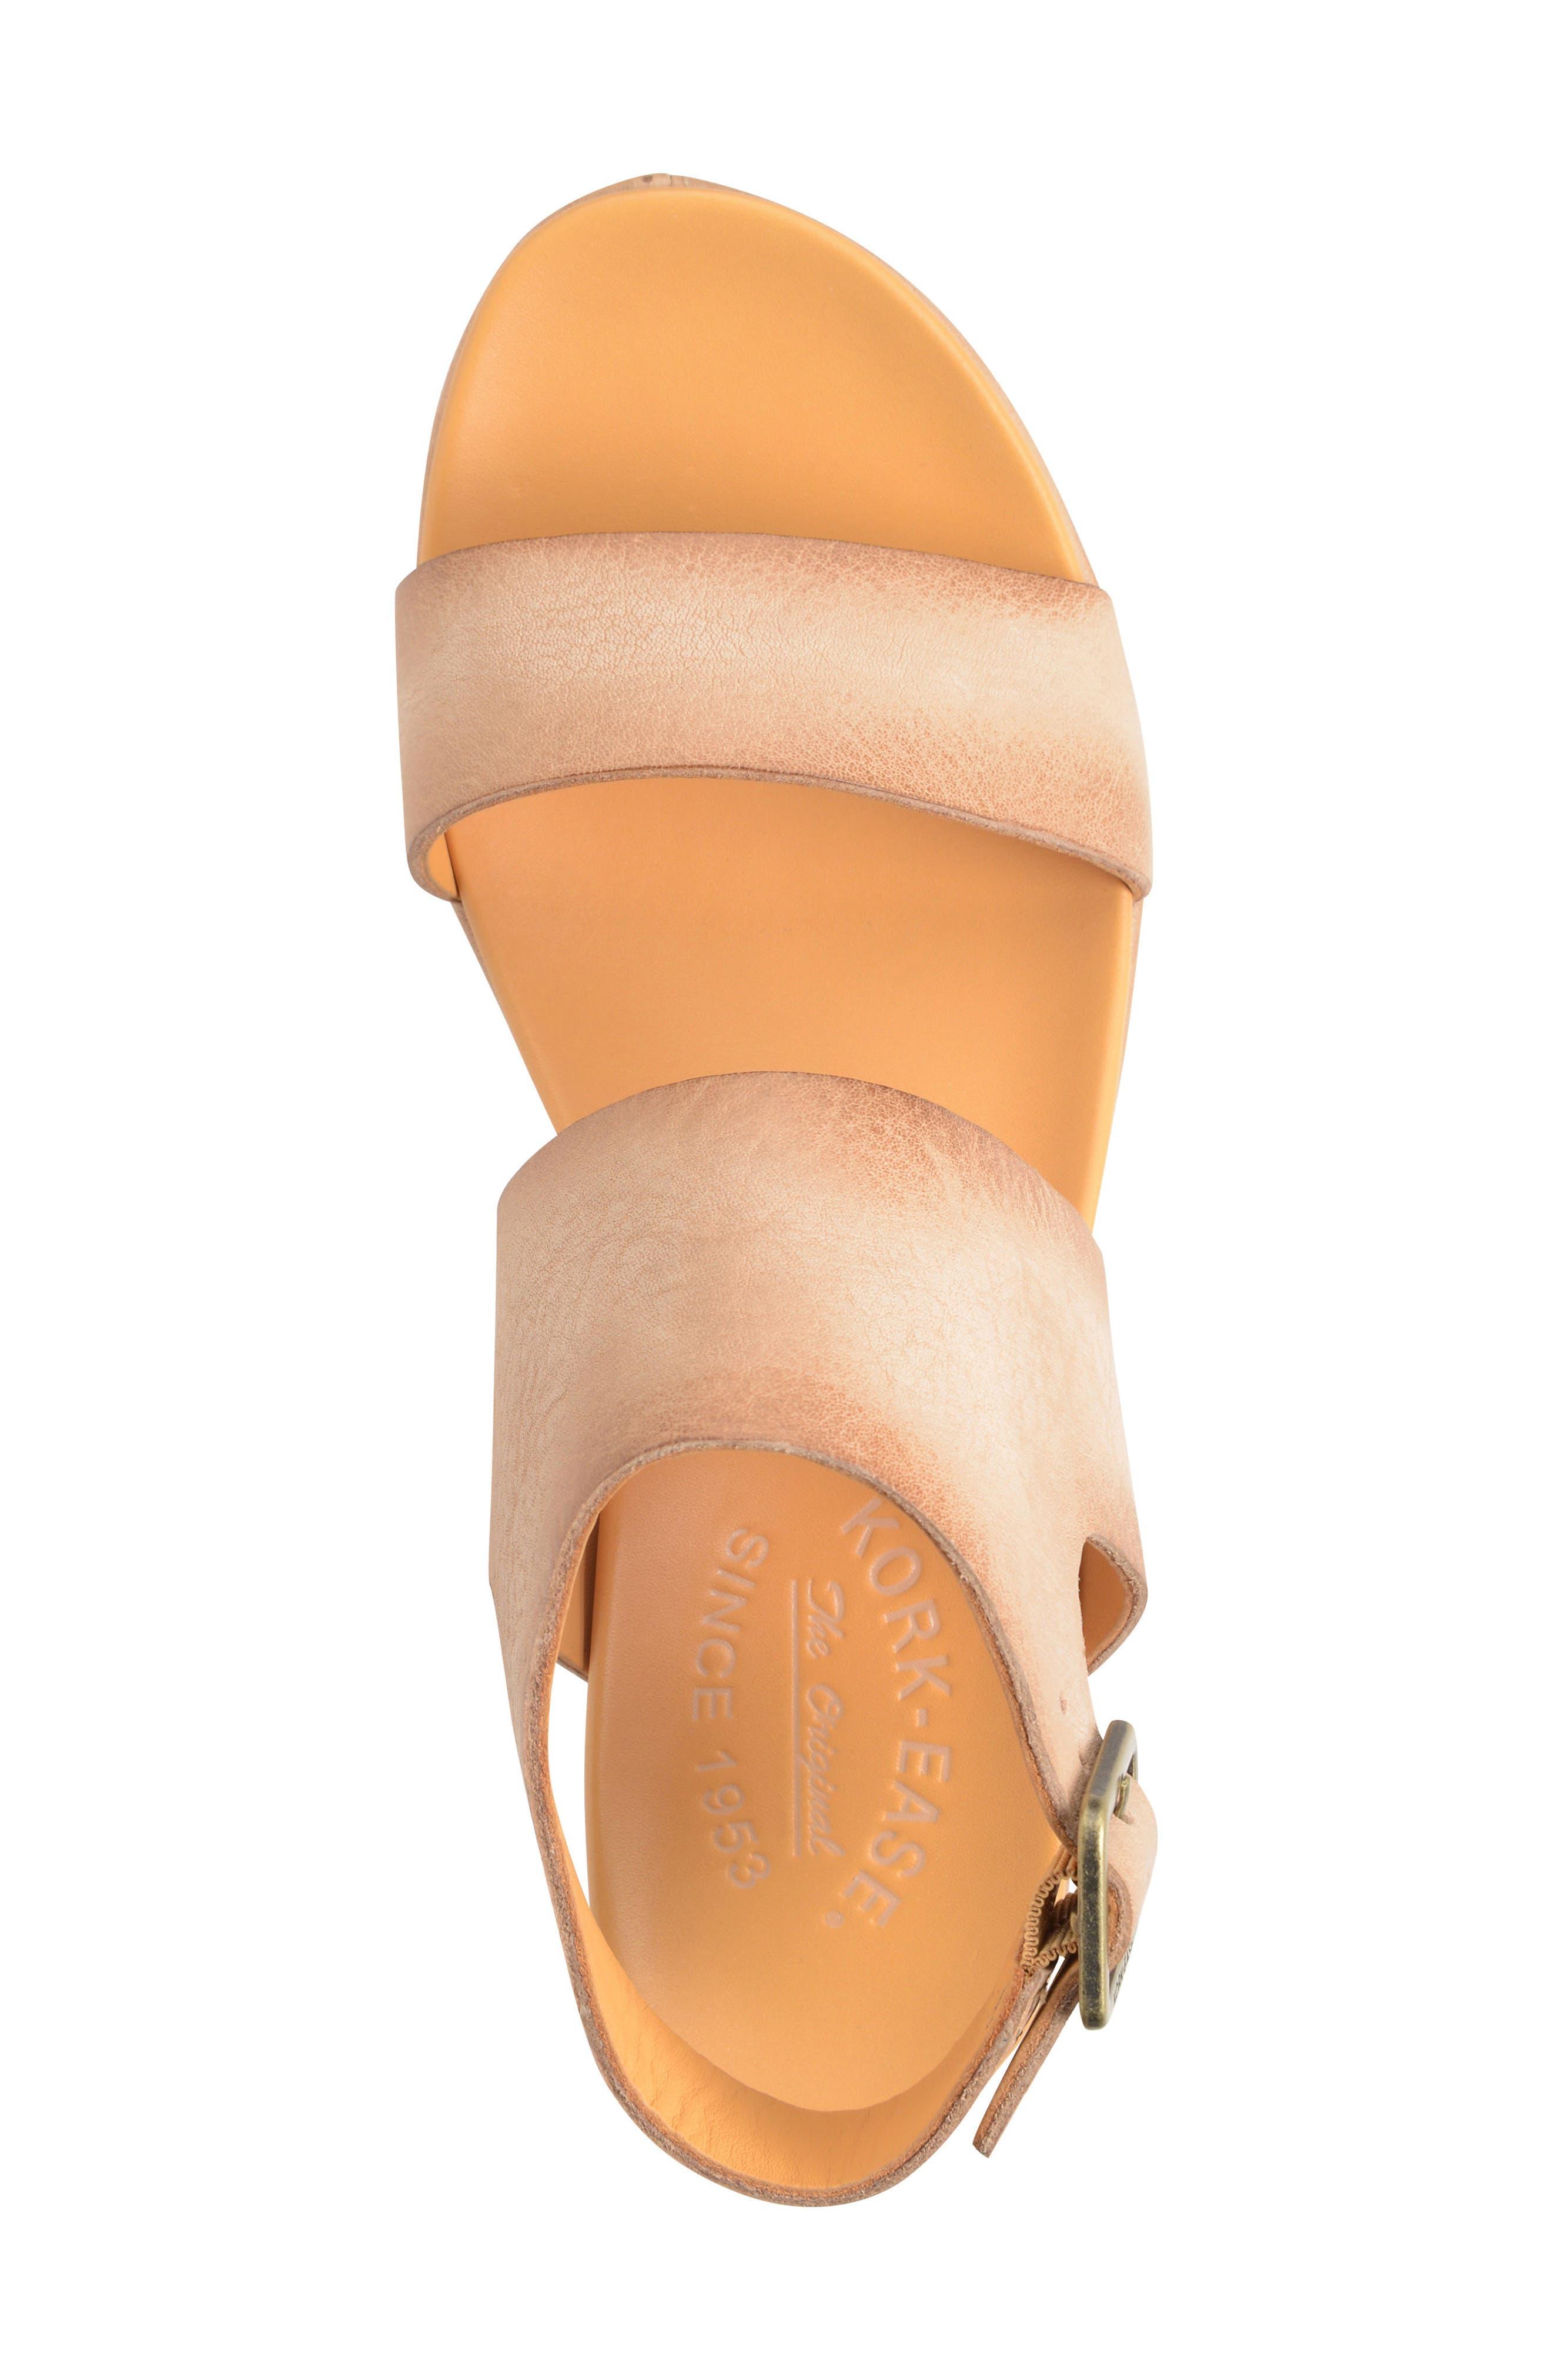 'Khloe' Platform Wedge Sandal,                             Alternate thumbnail 14, color,